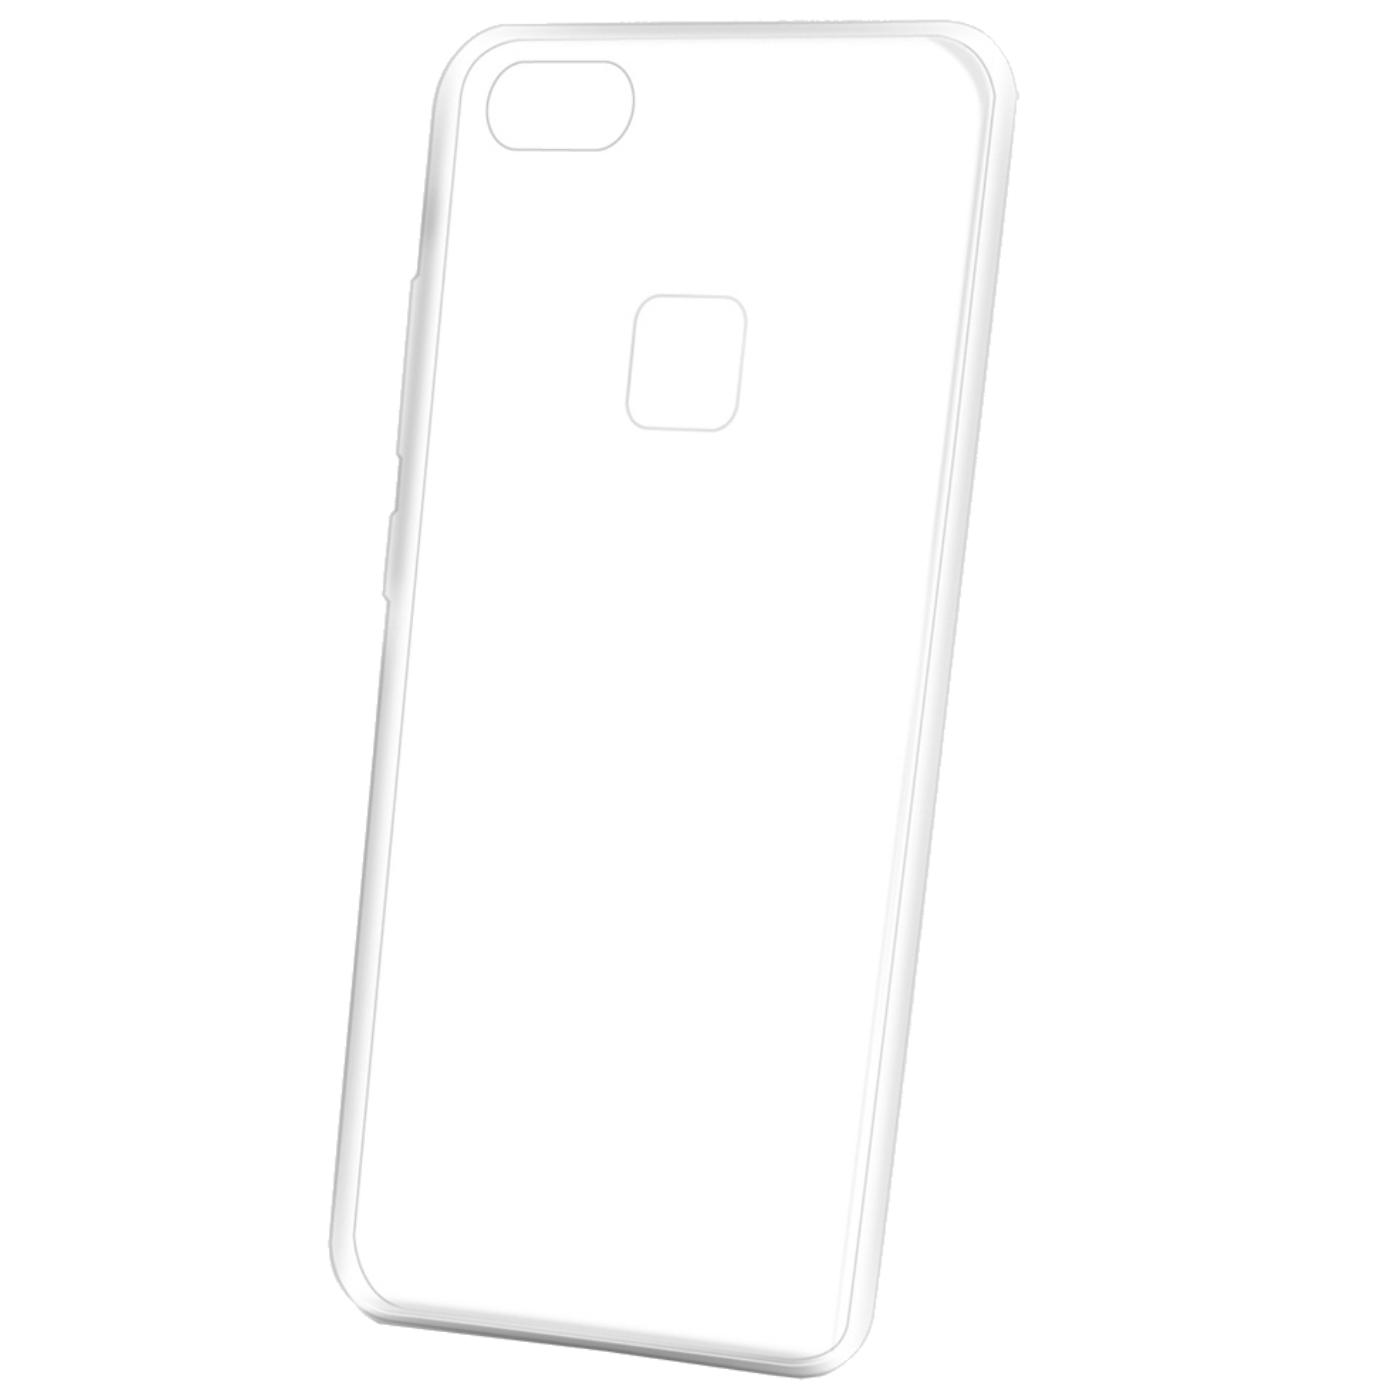 Futrola za mobitel Huawei P10 Lite, silikonska, providna